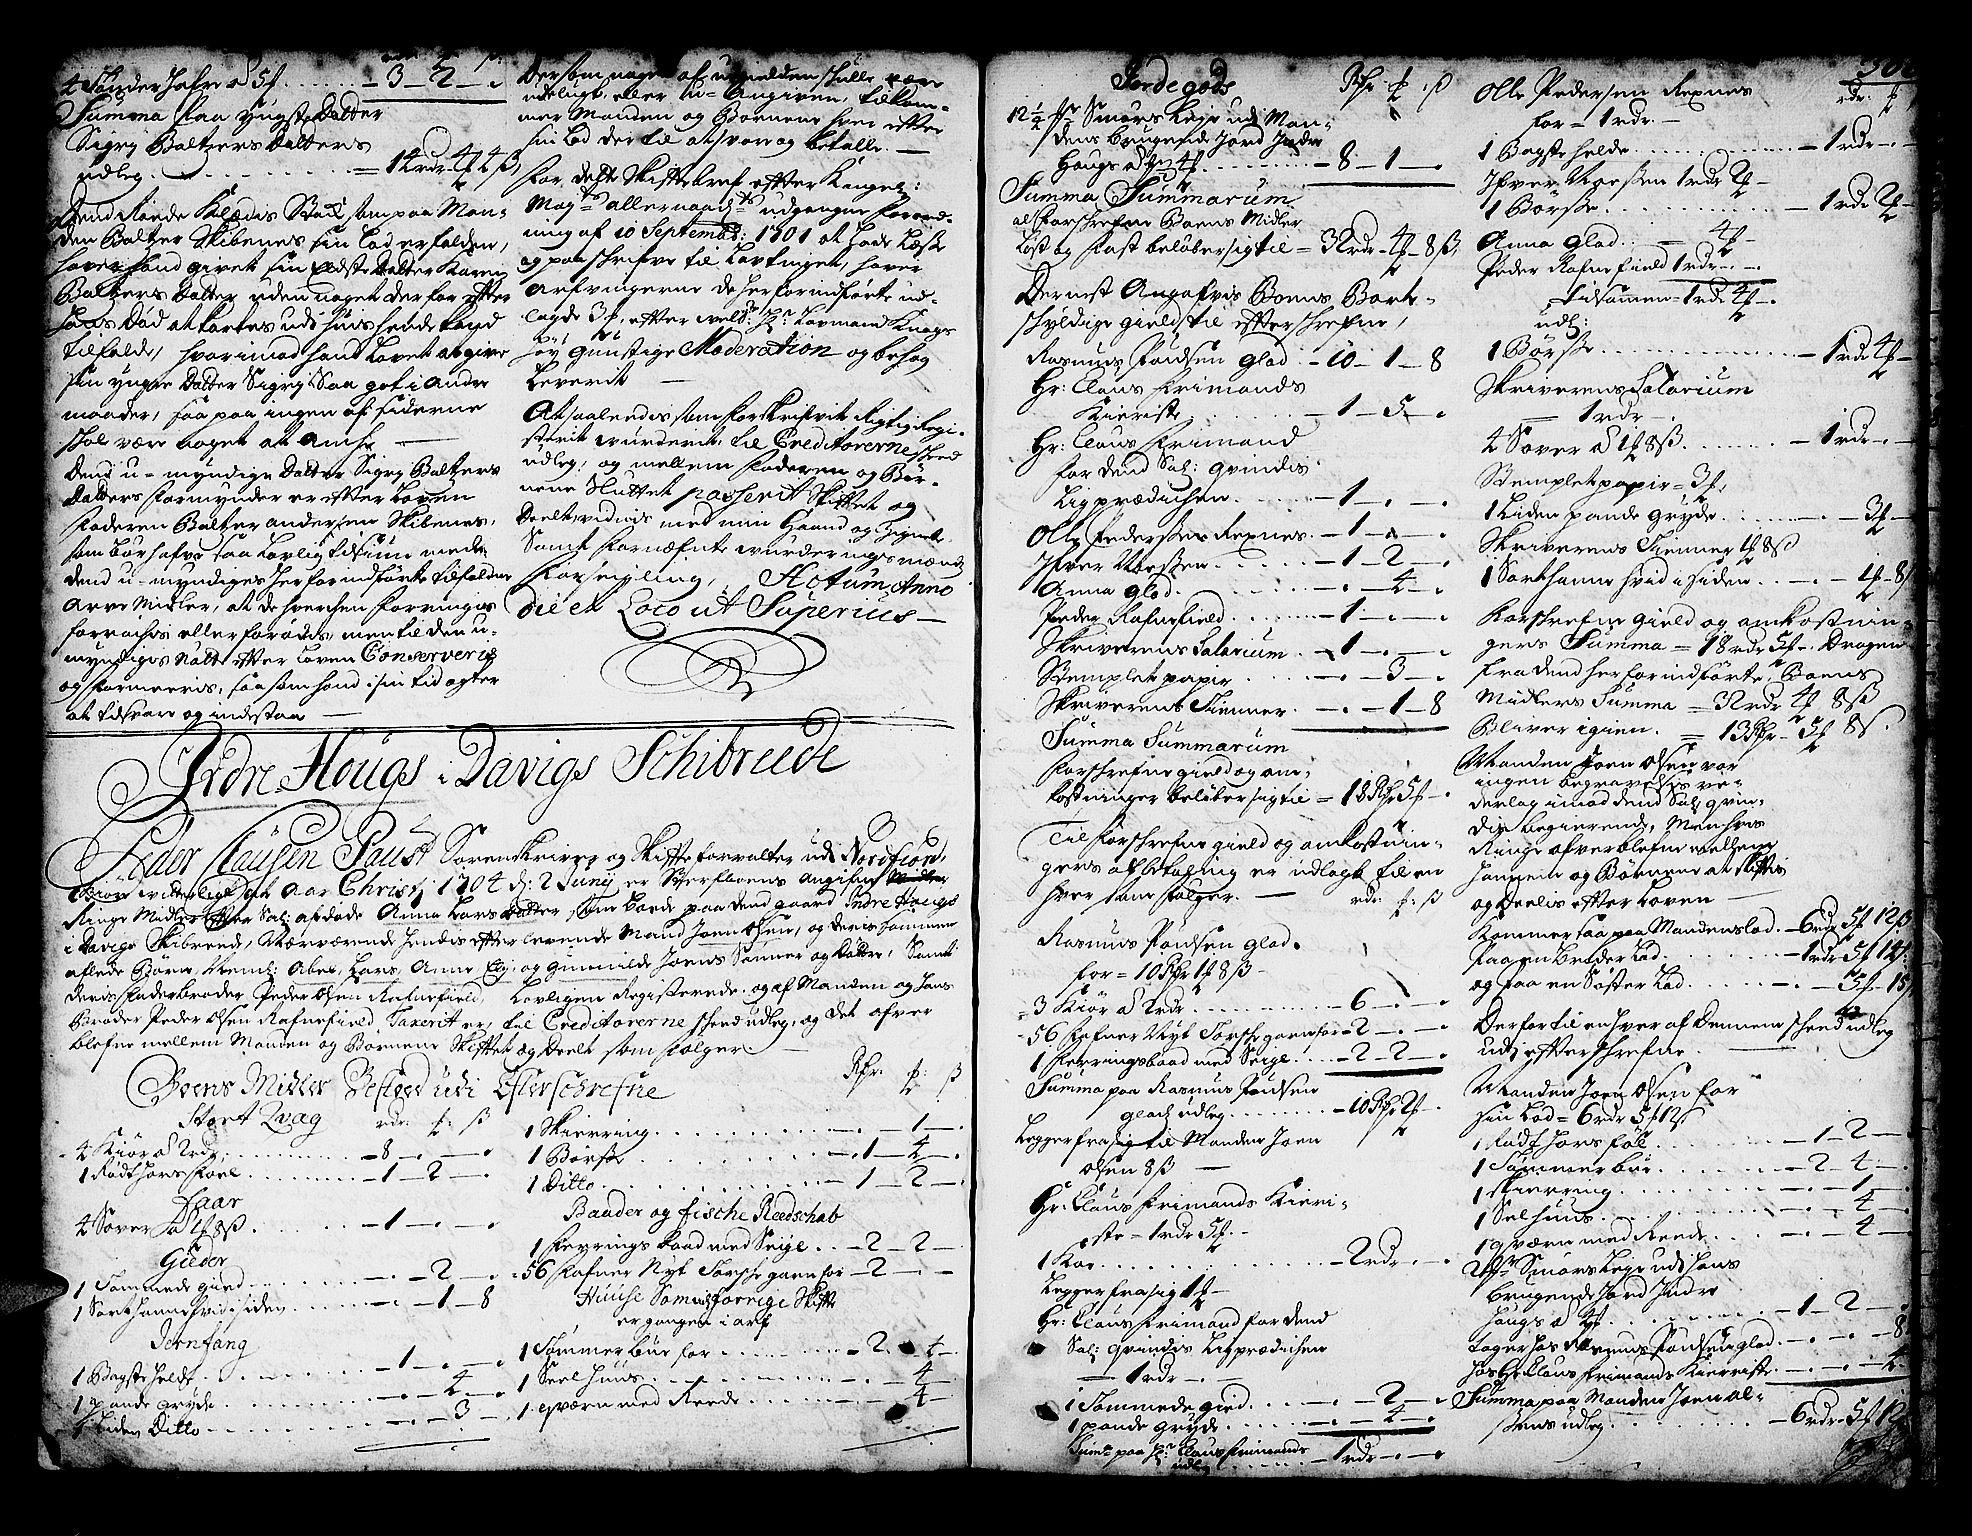 SAB, Nordfjord sorenskriveri, 04/04a/L0002b: Skifteprotokollar, 1702-1704, p. 365b-366a